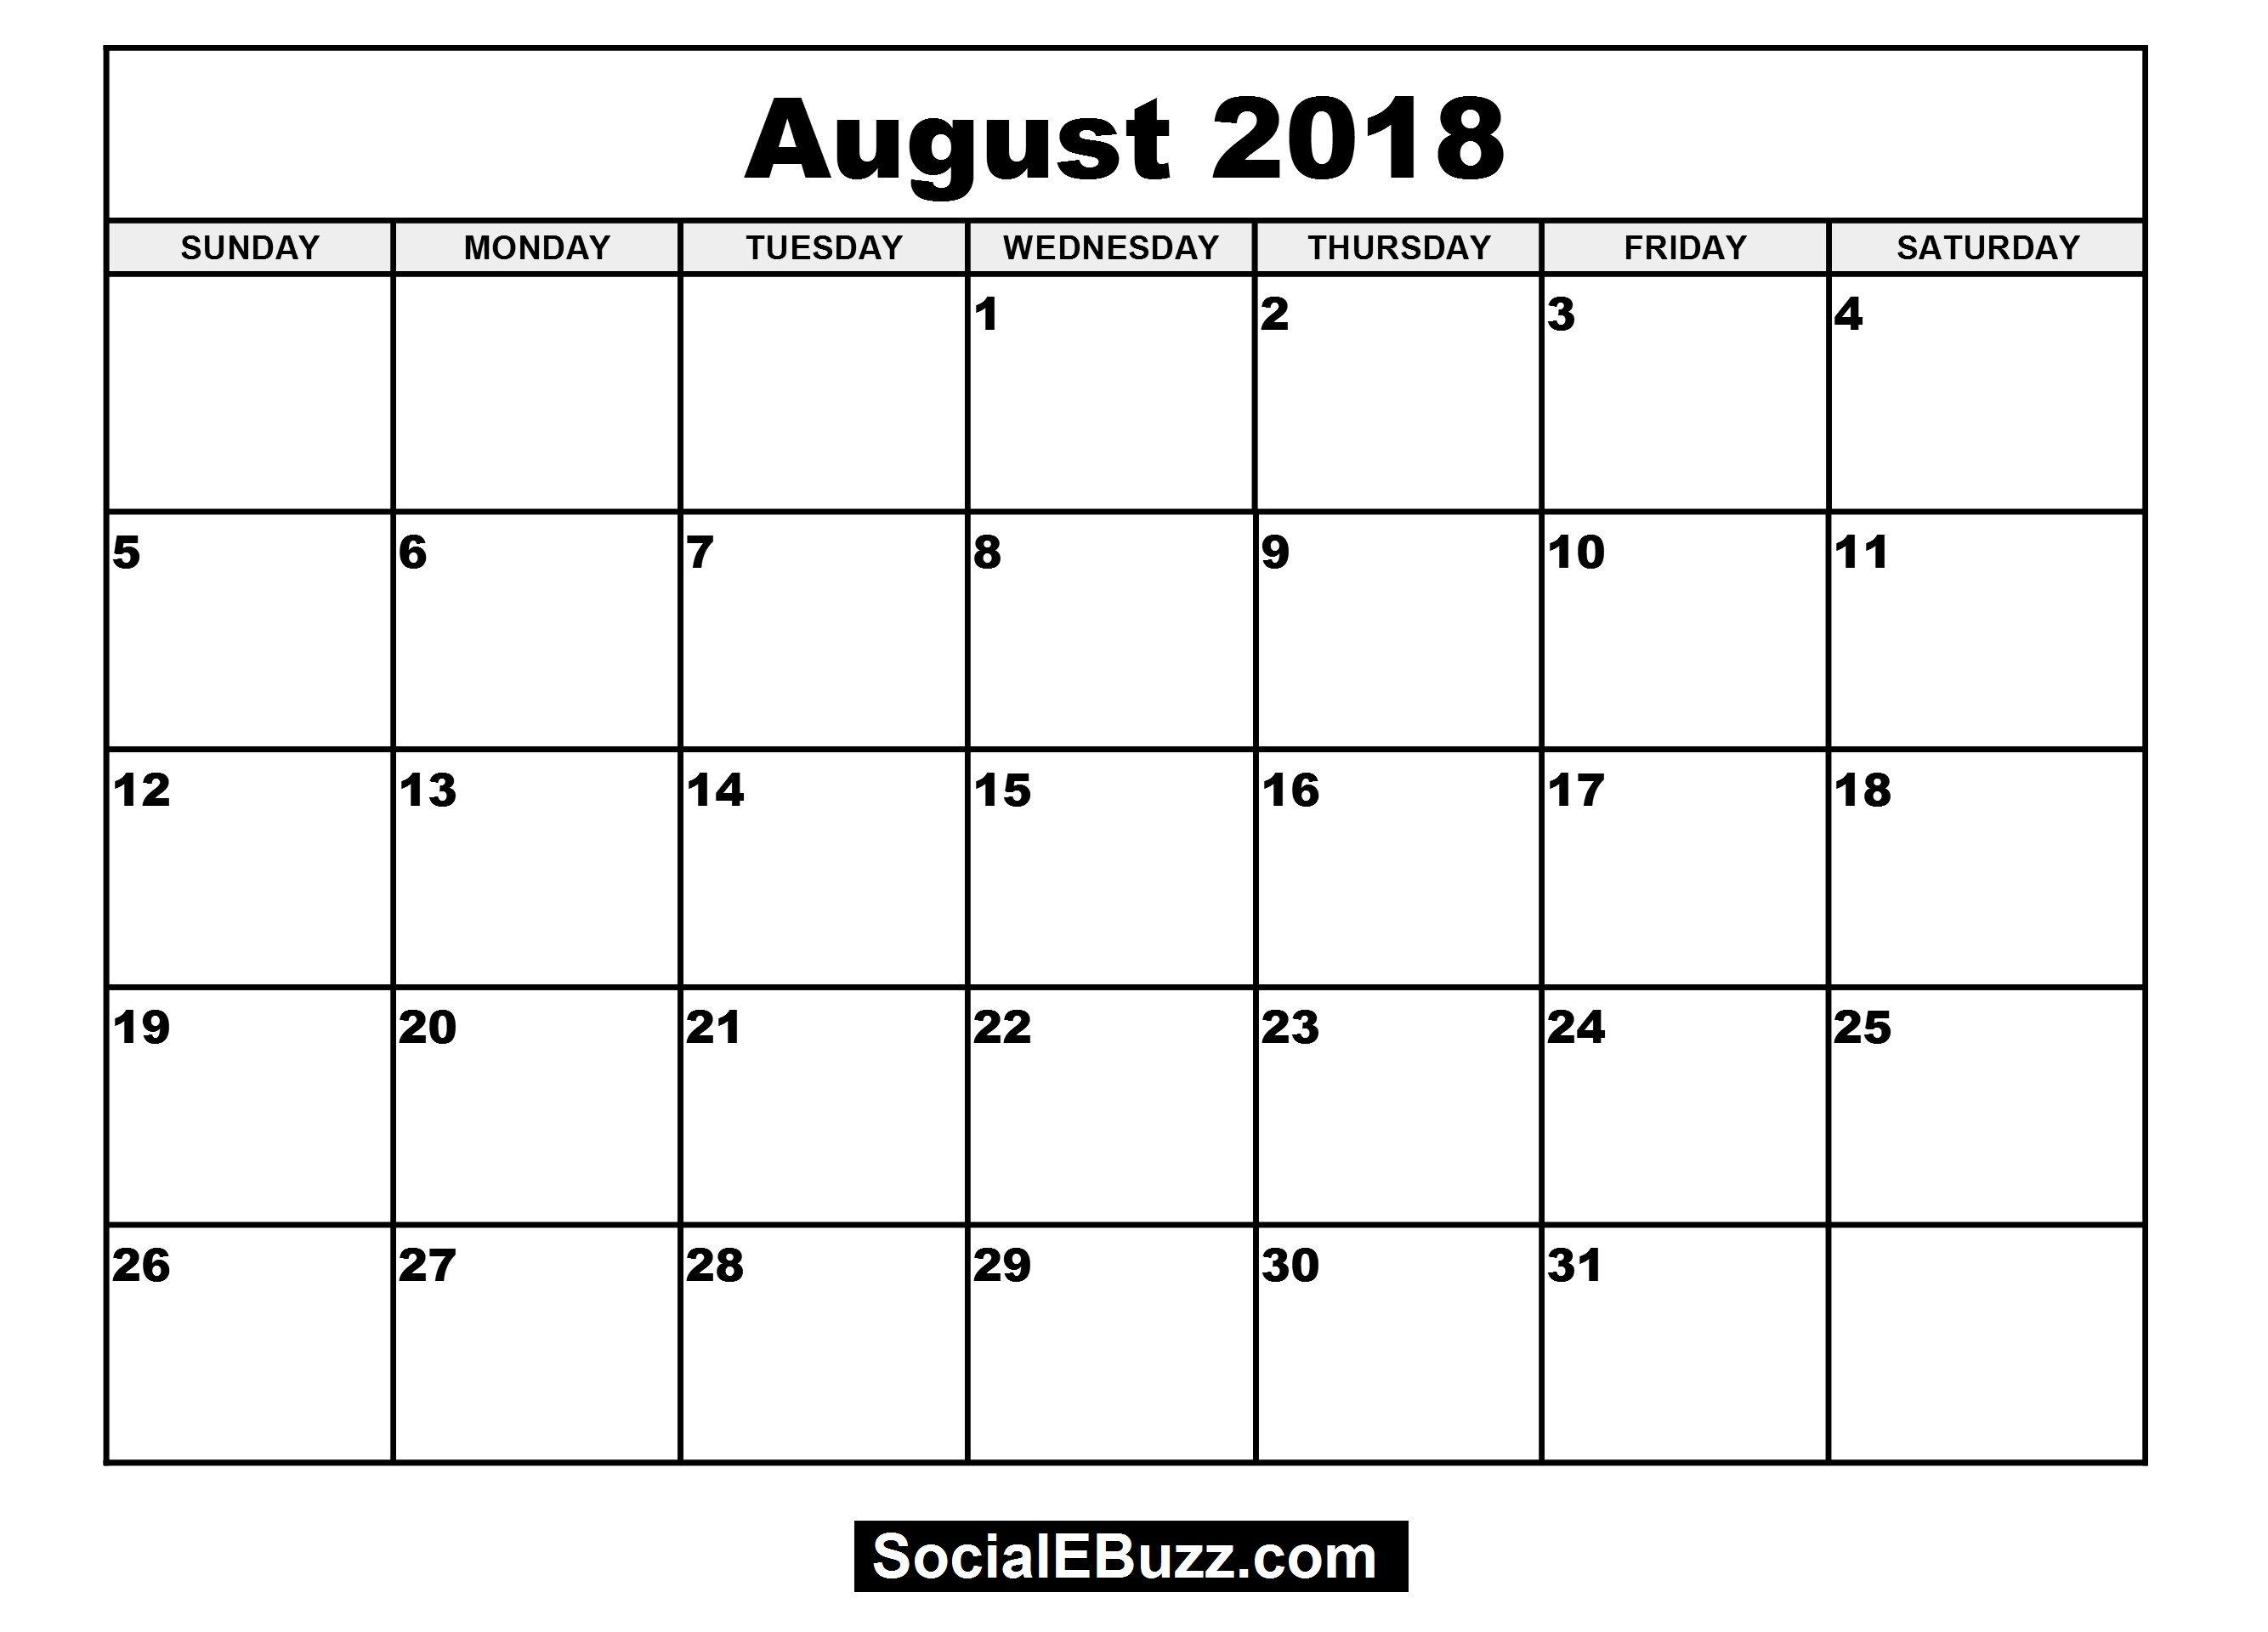 Pincalendar Printable On August 2018 Calendar | 2018 Calendar in August Blank Calendar Printable